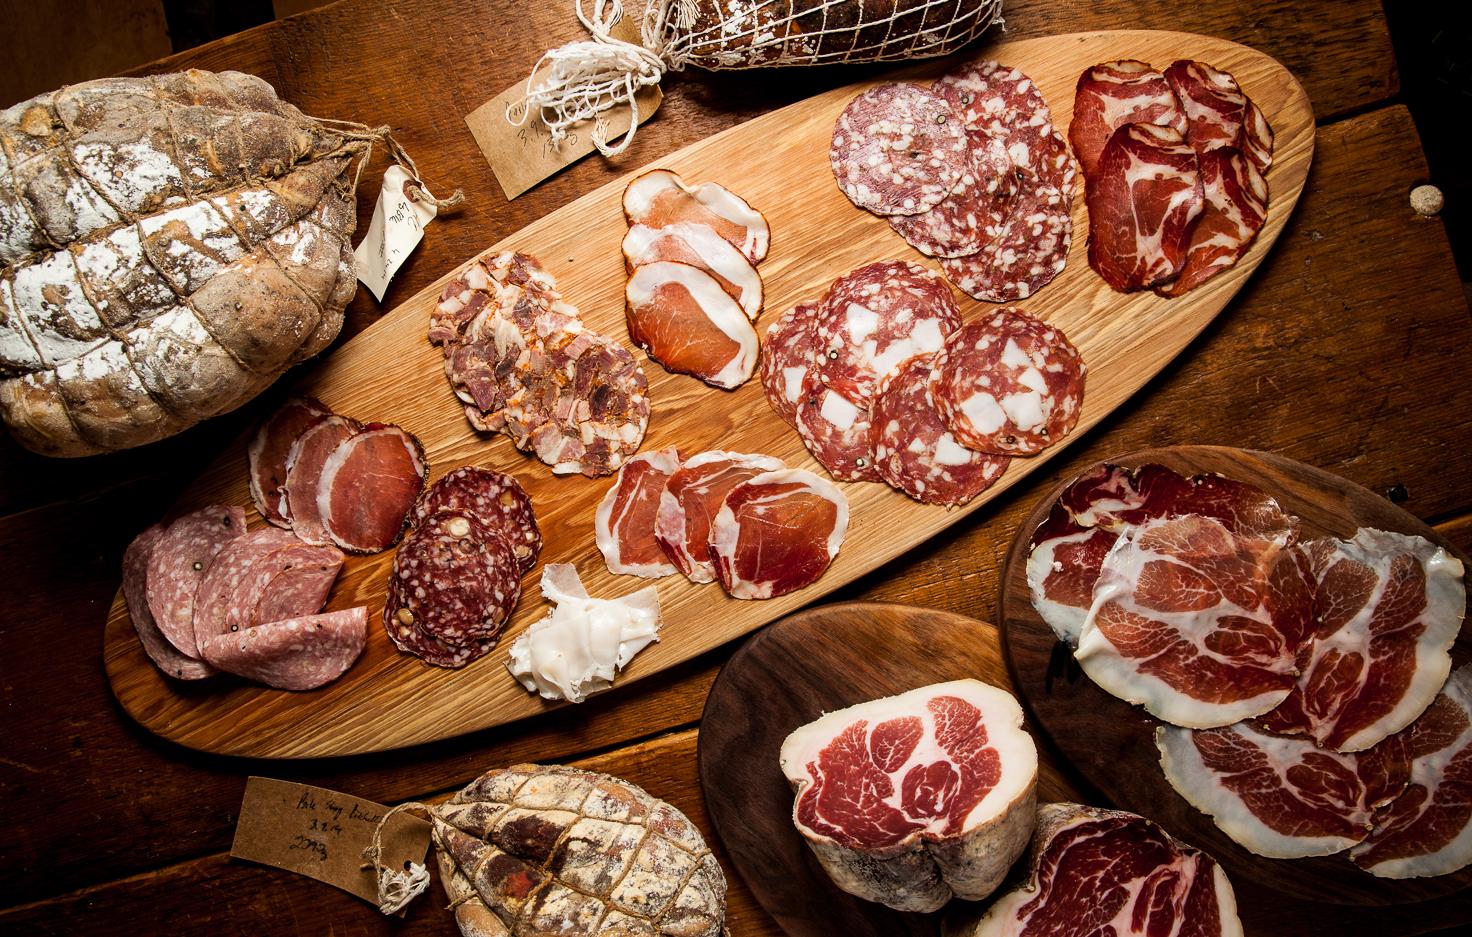 Cured meats at Salume Beddu in St. Louis, MO.